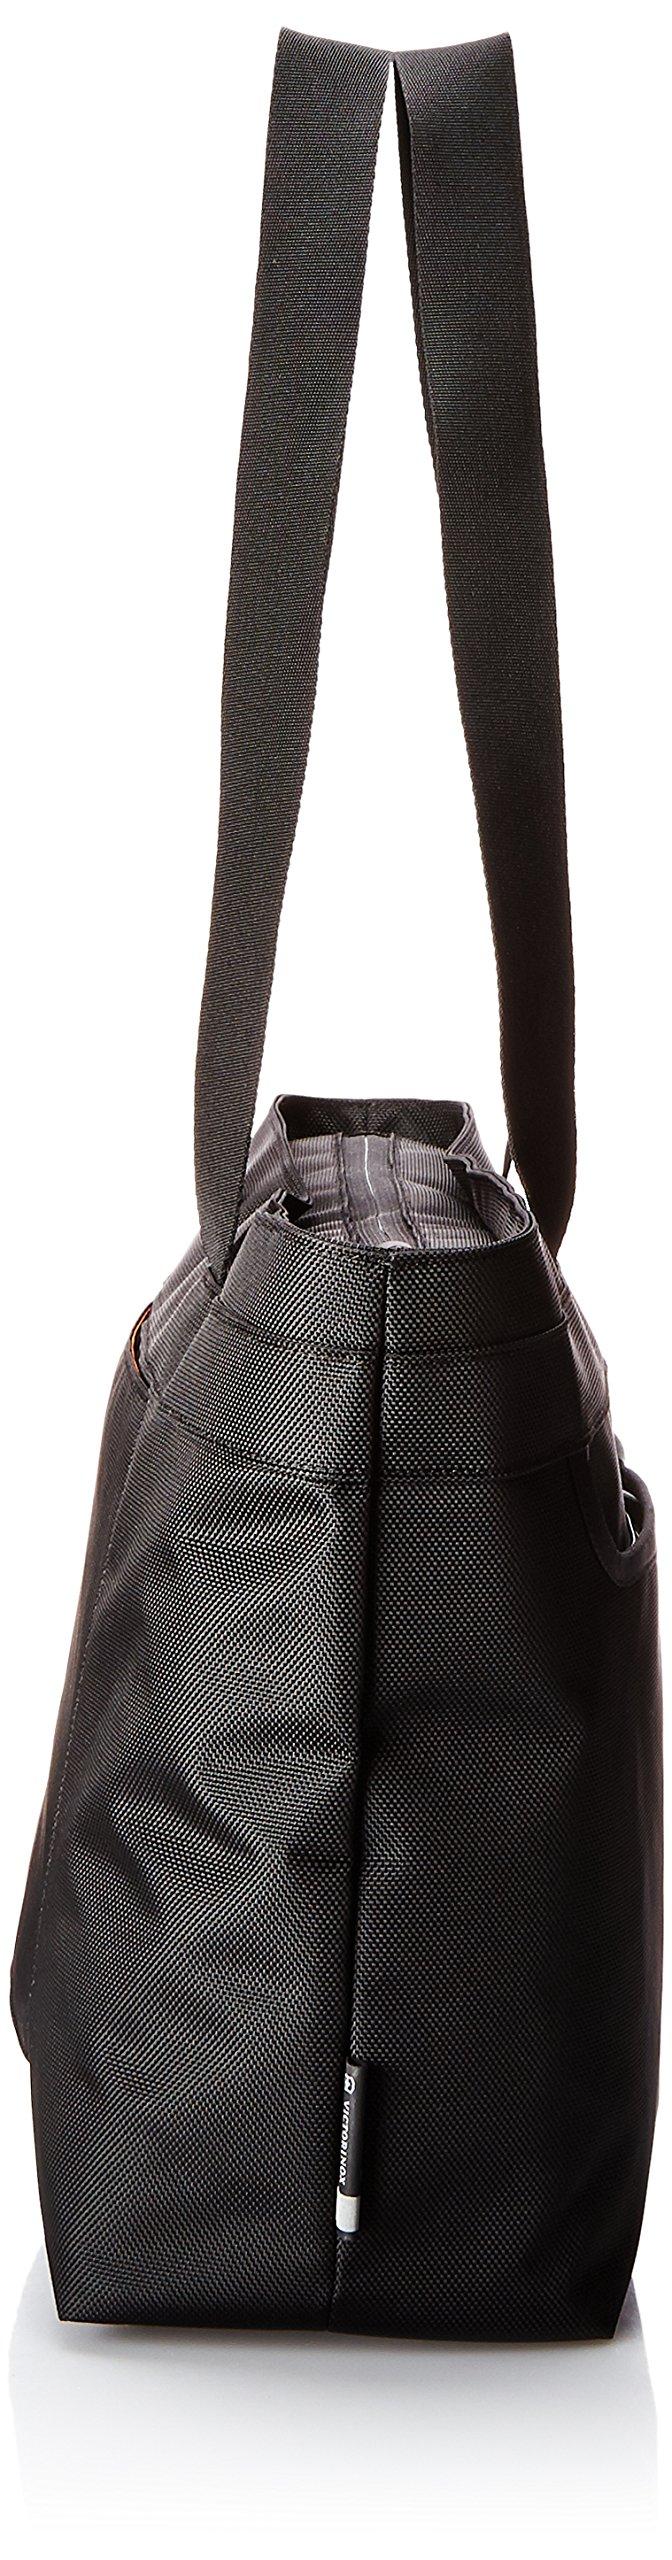 Victorinox Werks Traveler 5.0 WT Shopping Tote, Black, One Size by Victorinox (Image #4)